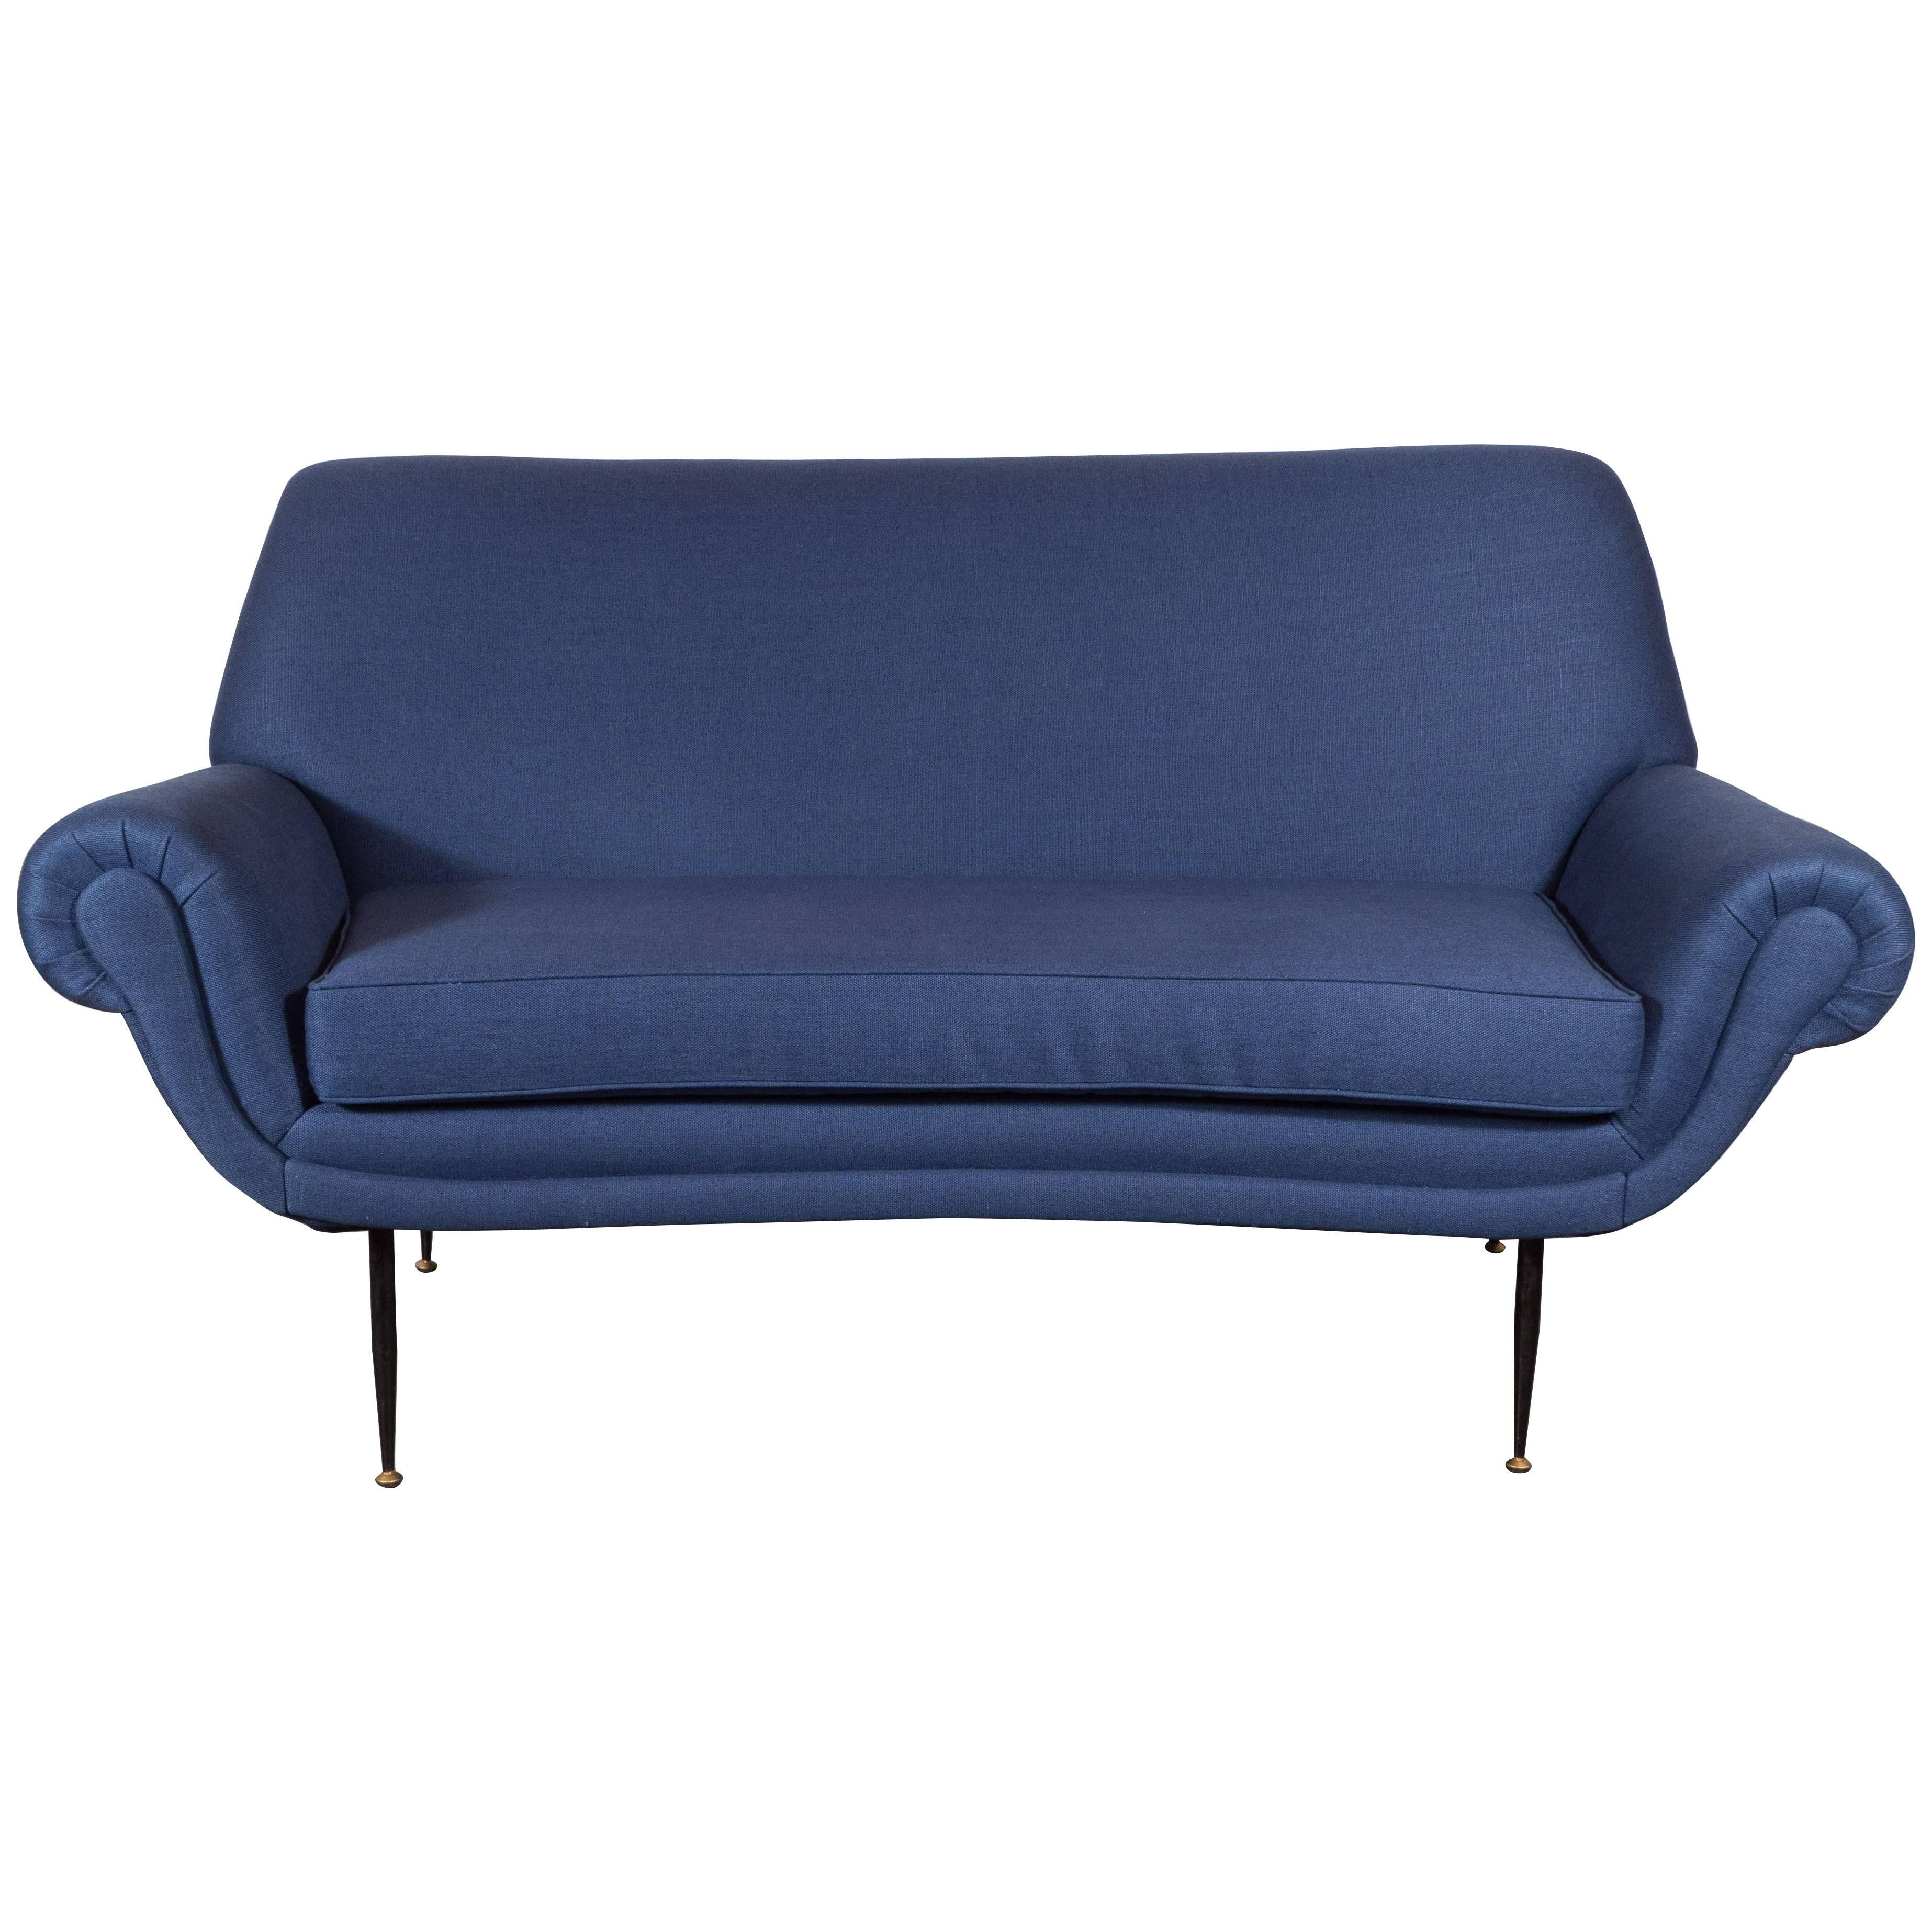 Italian Mid Century Modern Sofa Or Loveseat In Royal Blue Cotton U0026 Linen  Blend